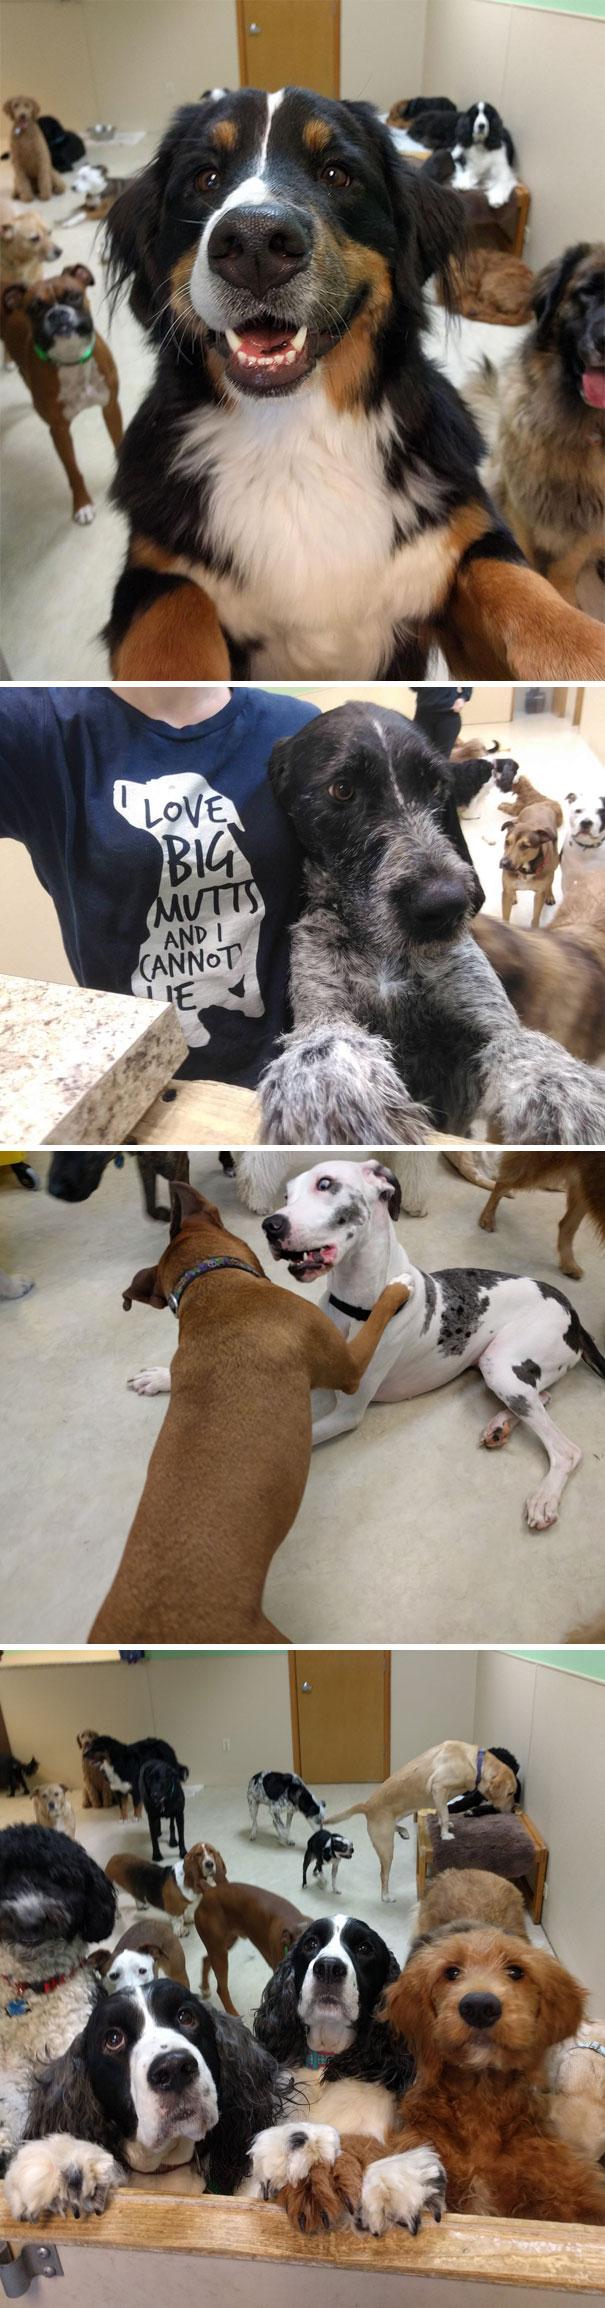 Animales refugio